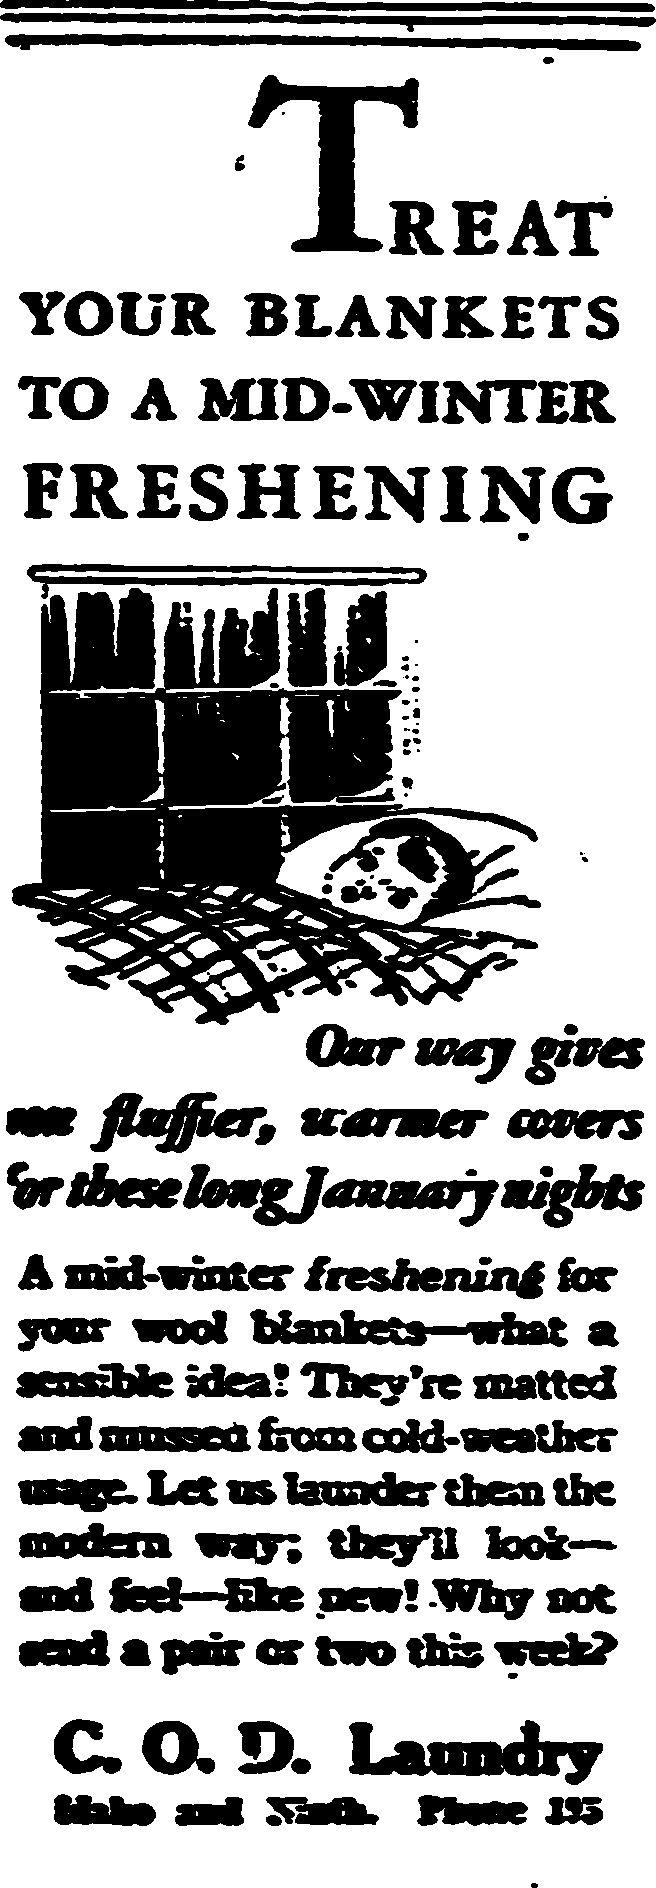 FB 01271930 Blankets.jpg